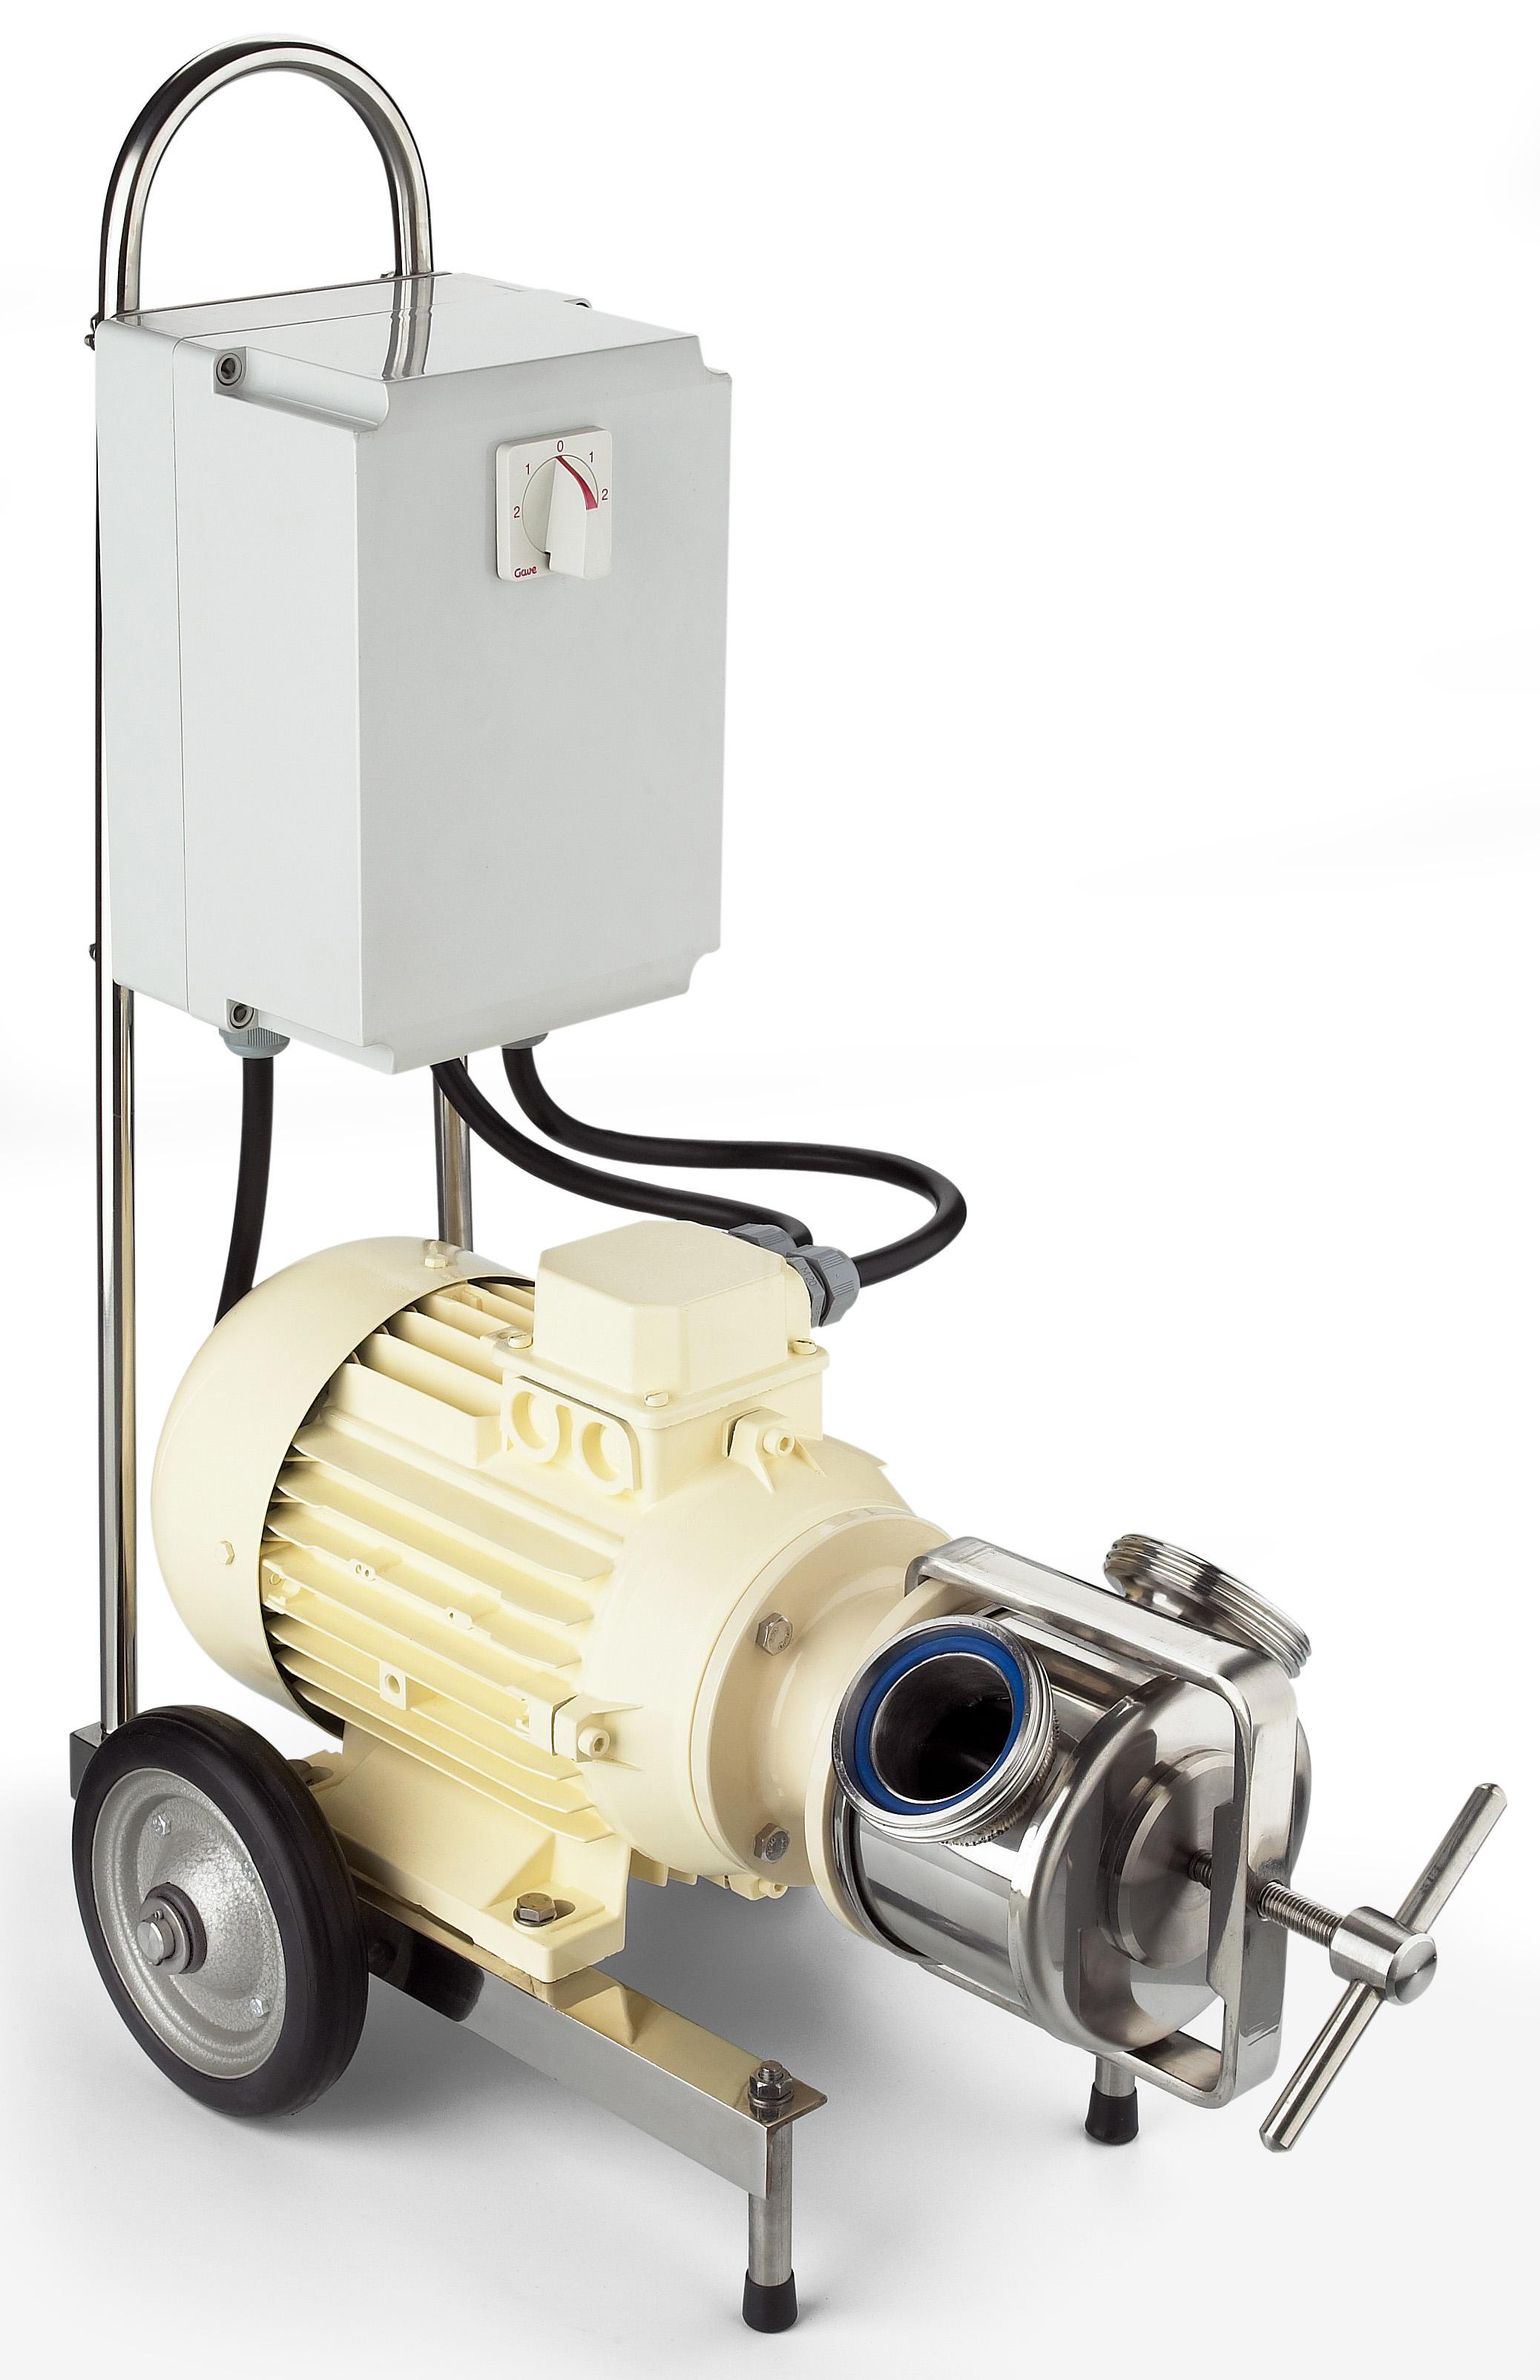 Self-priming Pumps in the Sanitary Series